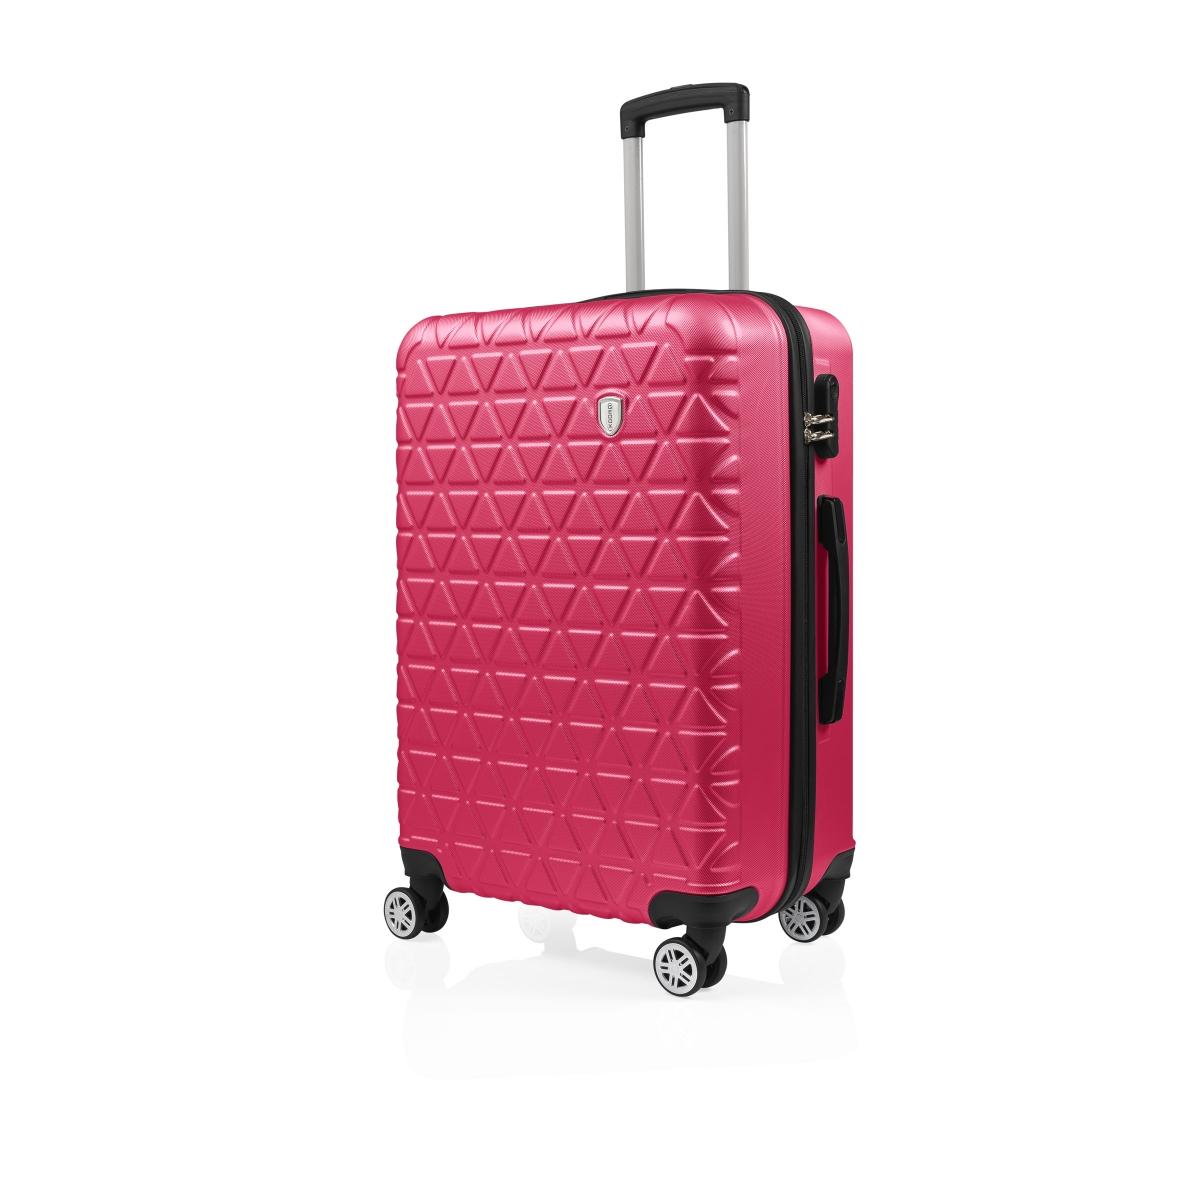 Gedox Abs 3'lü Valiz Seyahat Seti - Model:800.10 Fuşya Pembe